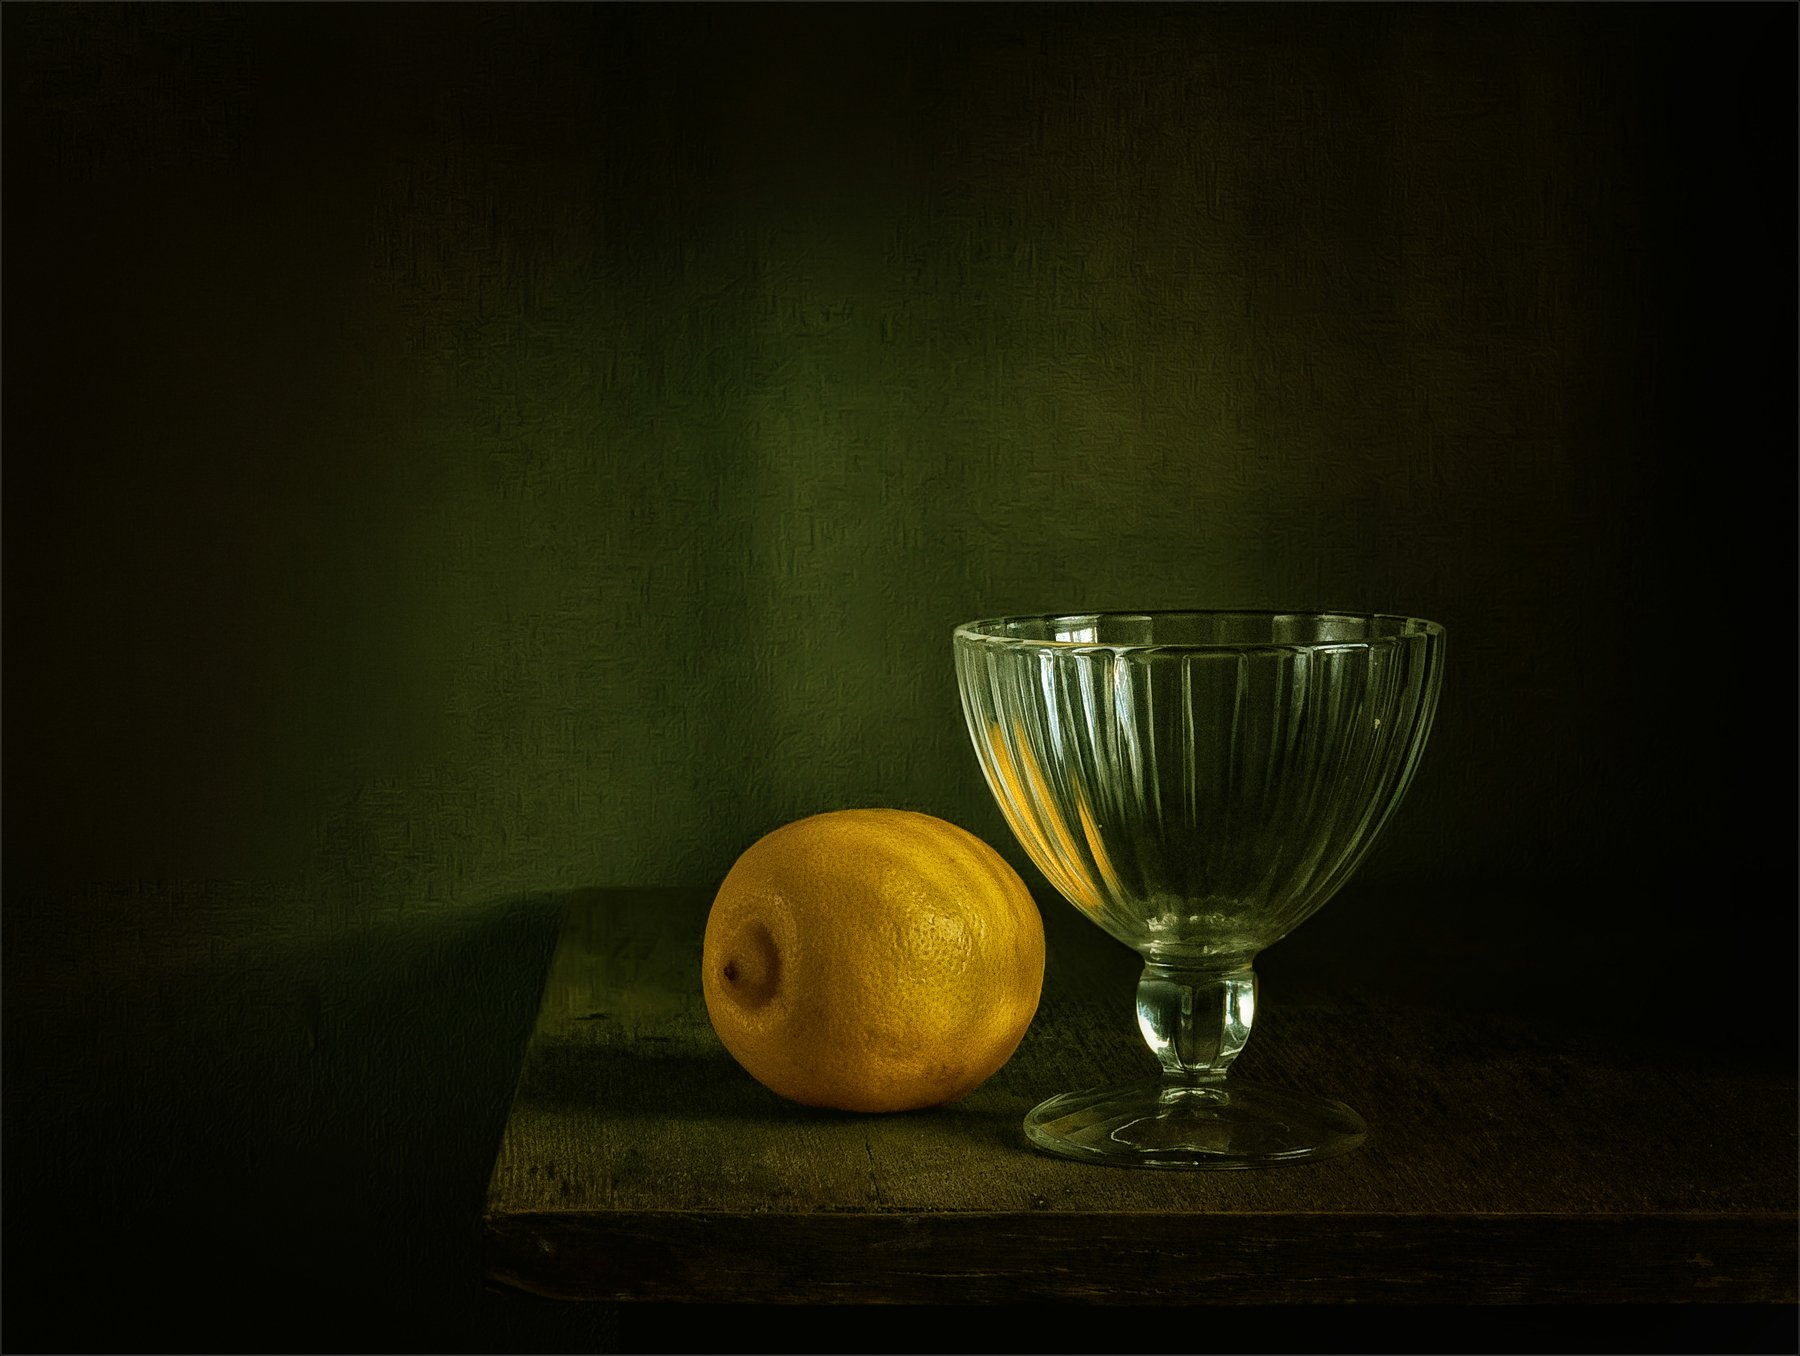 still life, натюрморт, креманка, стекло, посуда, лимон, цитрусовые, еда, минимализм, винтаж,, Михаил MSH